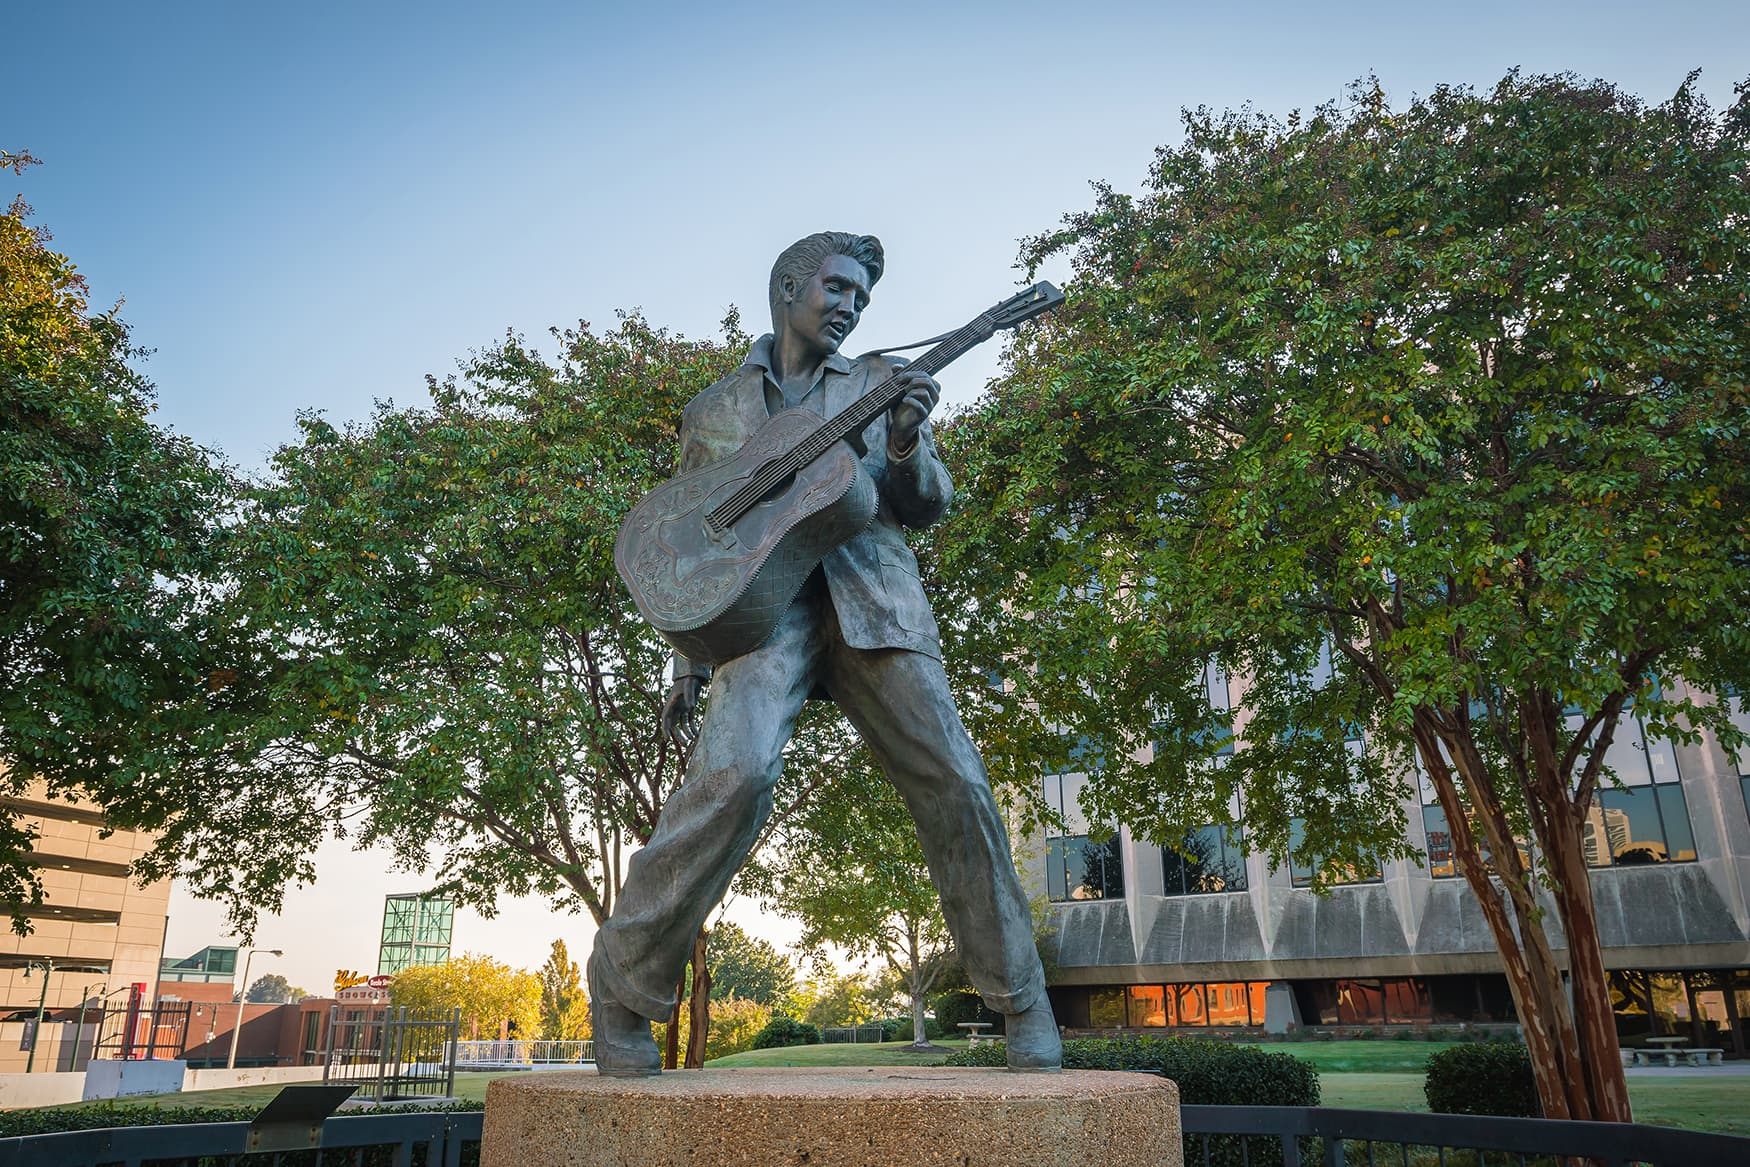 Elvis Presley Statue in Memphis